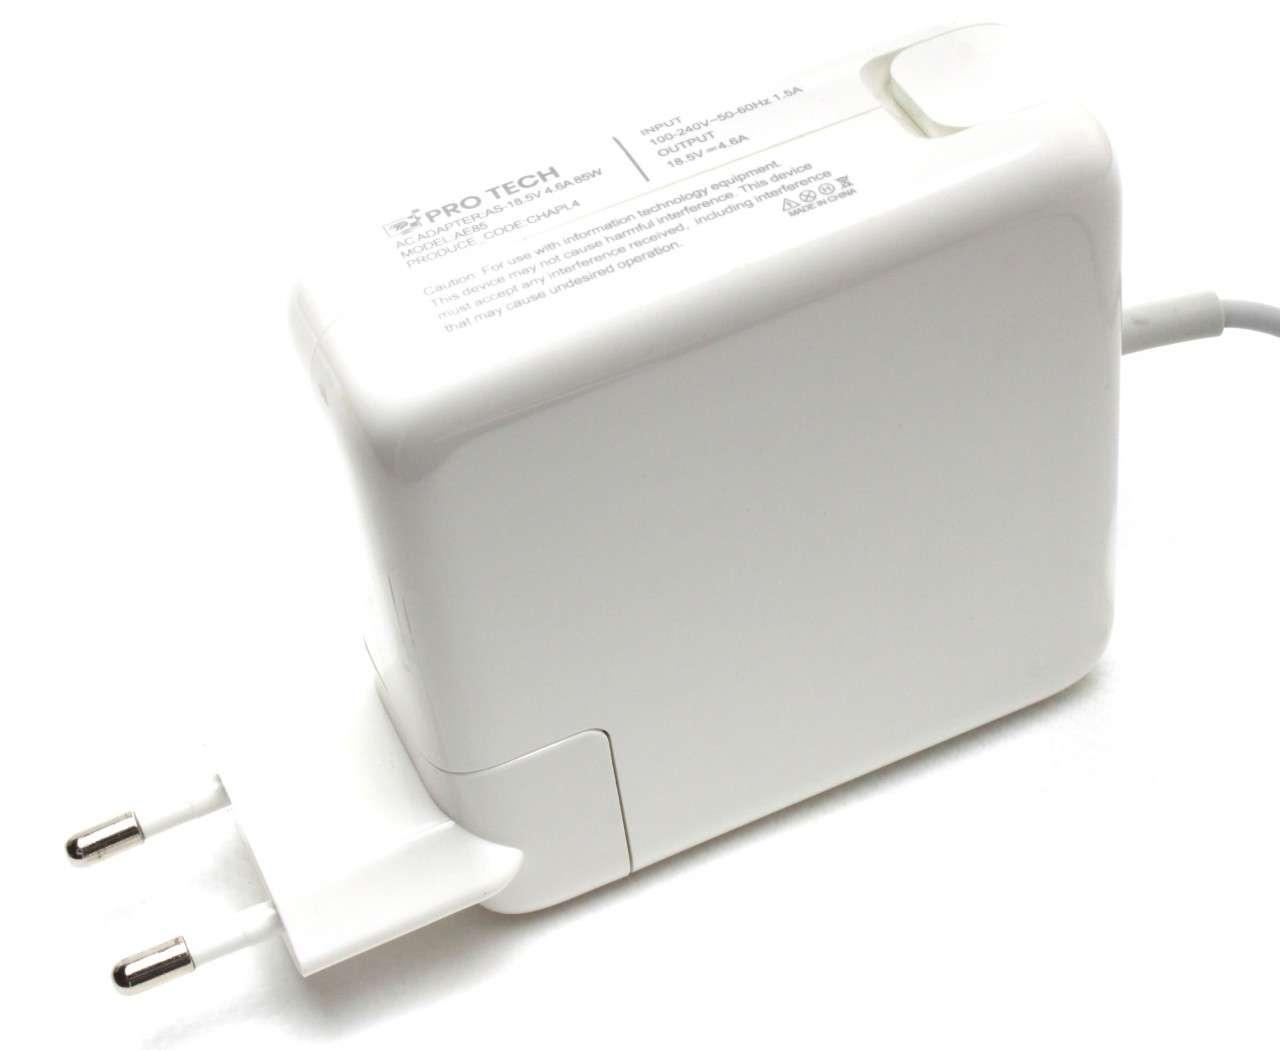 Incarcator Apple MacBook Pro 15 inch Late 2008 85W Replacement imagine powerlaptop.ro 2021